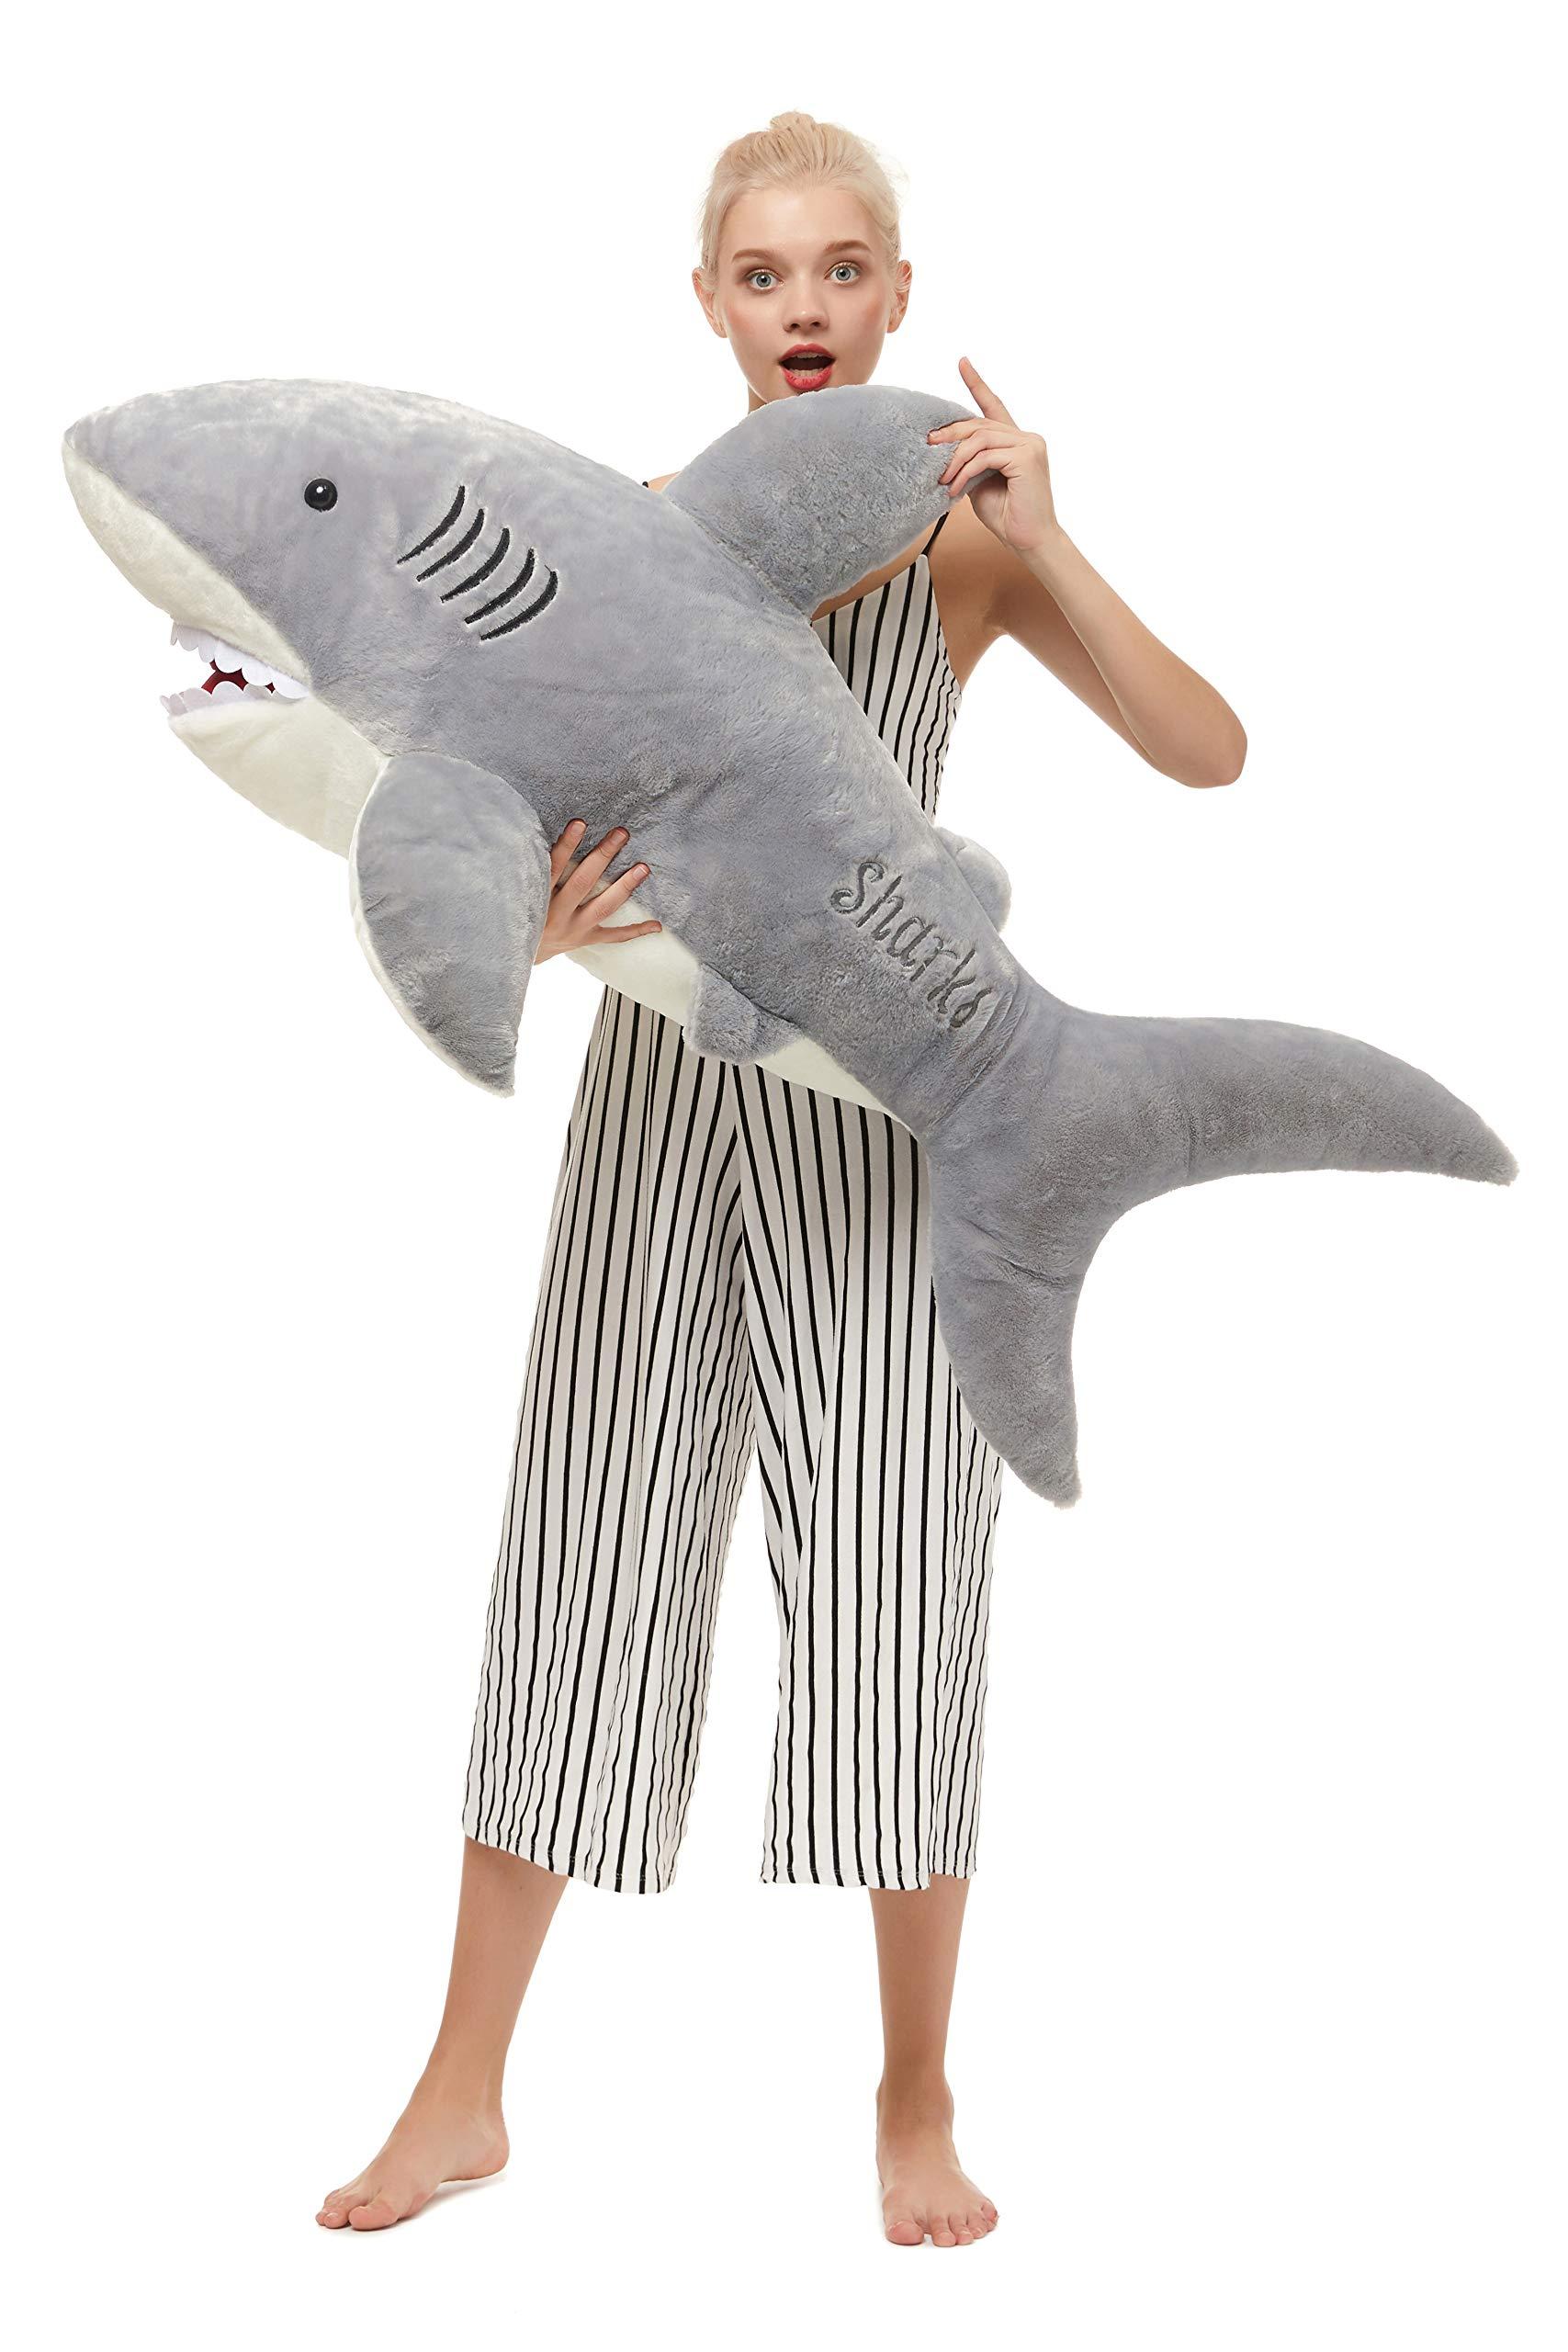 MorisMos Giant Shark Stuffed Animal,Gray Shark Plush Pillow,Plush Toy,Gift for Kids Girlfriend,51 Inches by MorisMos (Image #4)